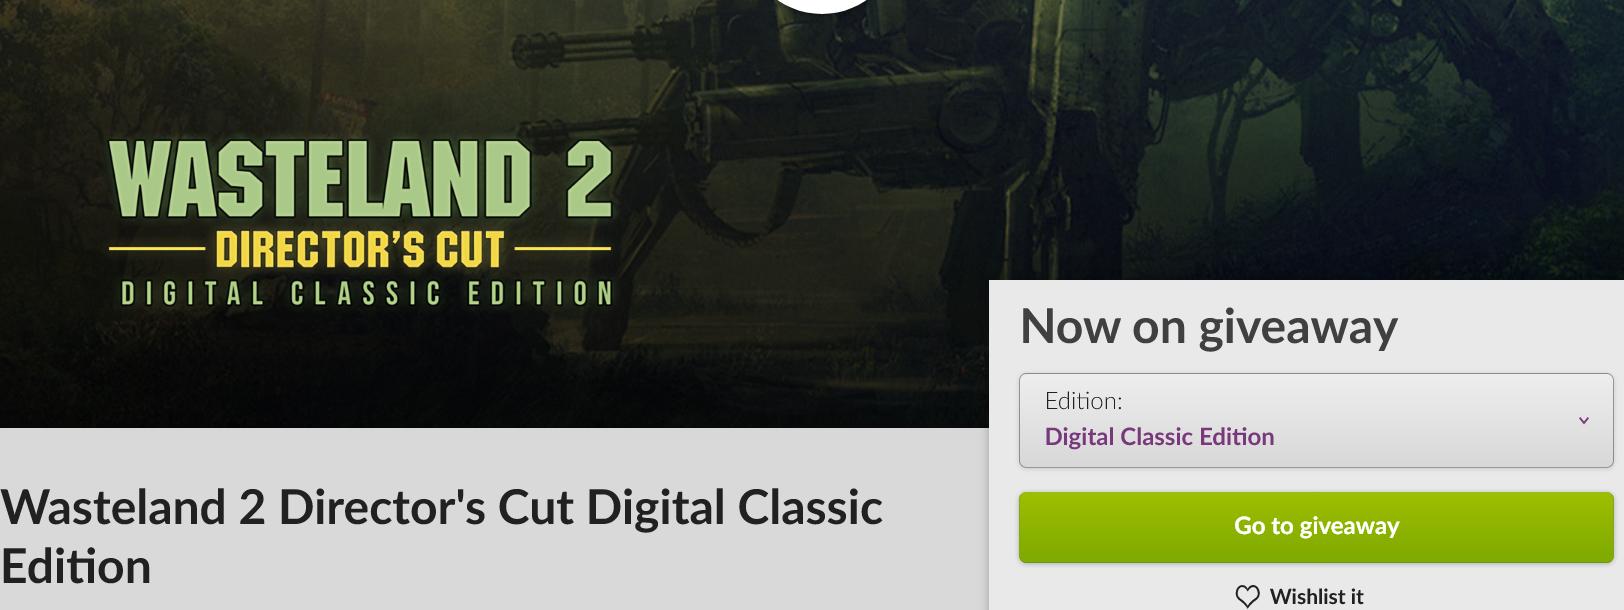 Screenshot_2019-12-11 Wasteland 2 Director's Cut Digital Classic Edition on GOG com.png